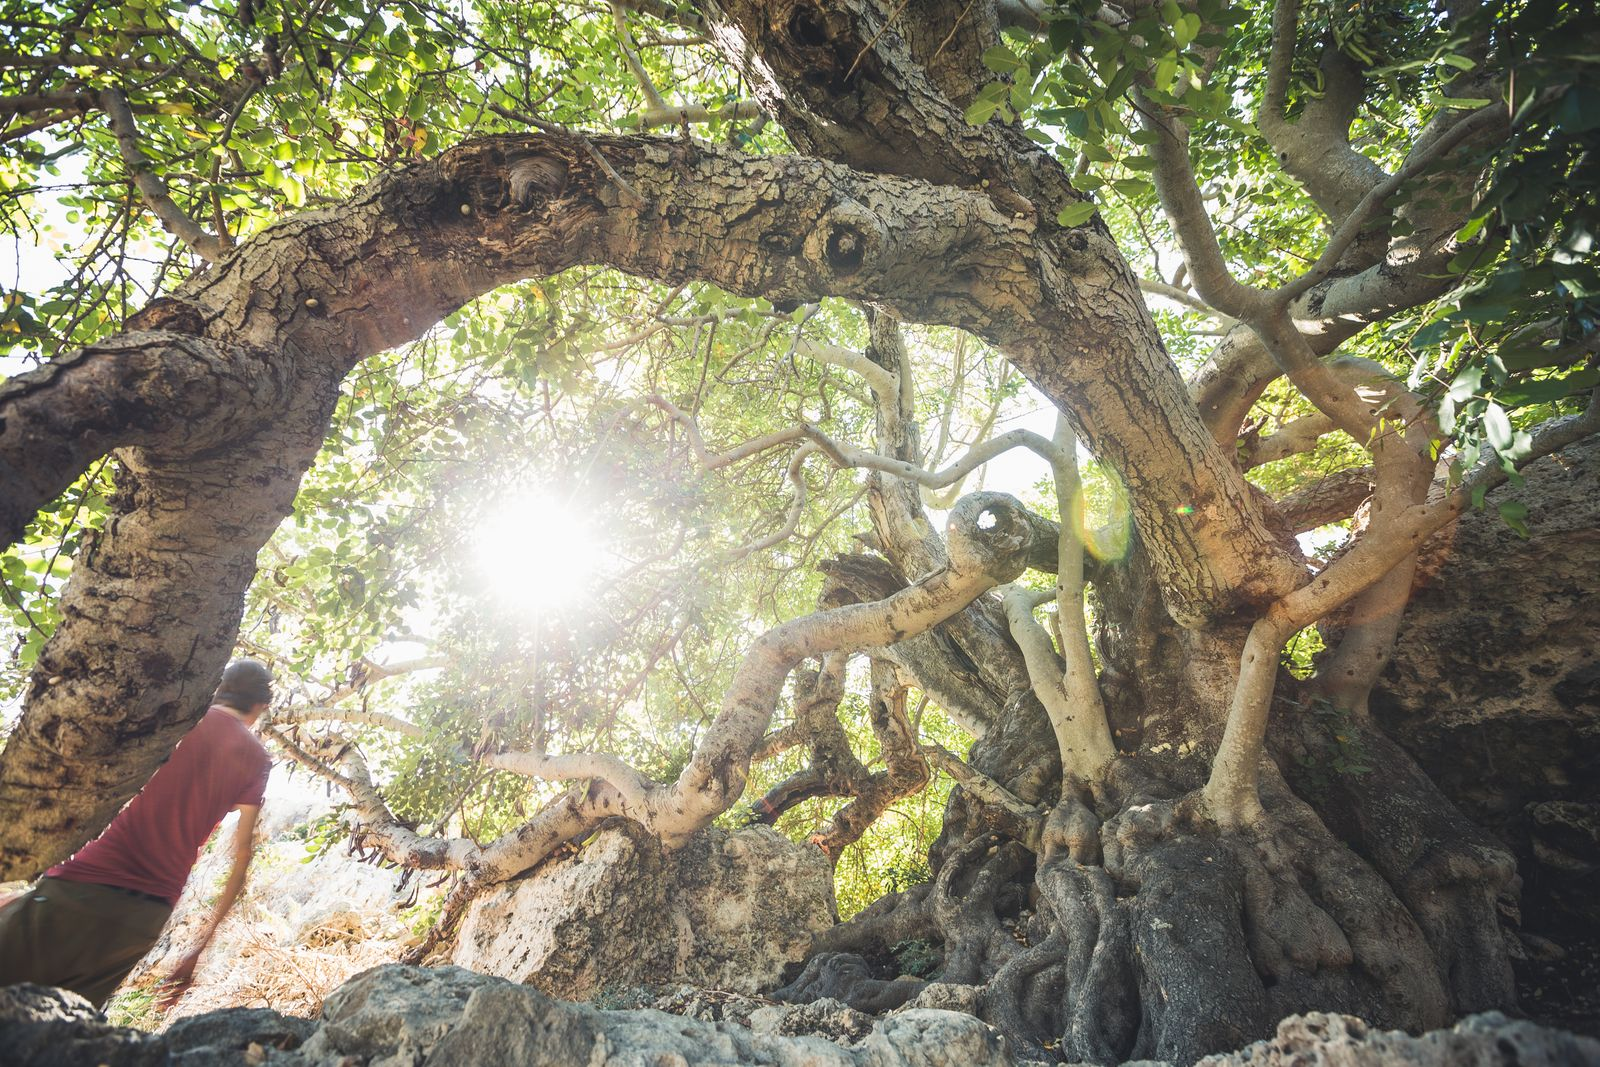 Outdoor-Malta19JPG-2 ältester Baum - Johannisbrotbaum auf dem Xemxija Heritage Trail